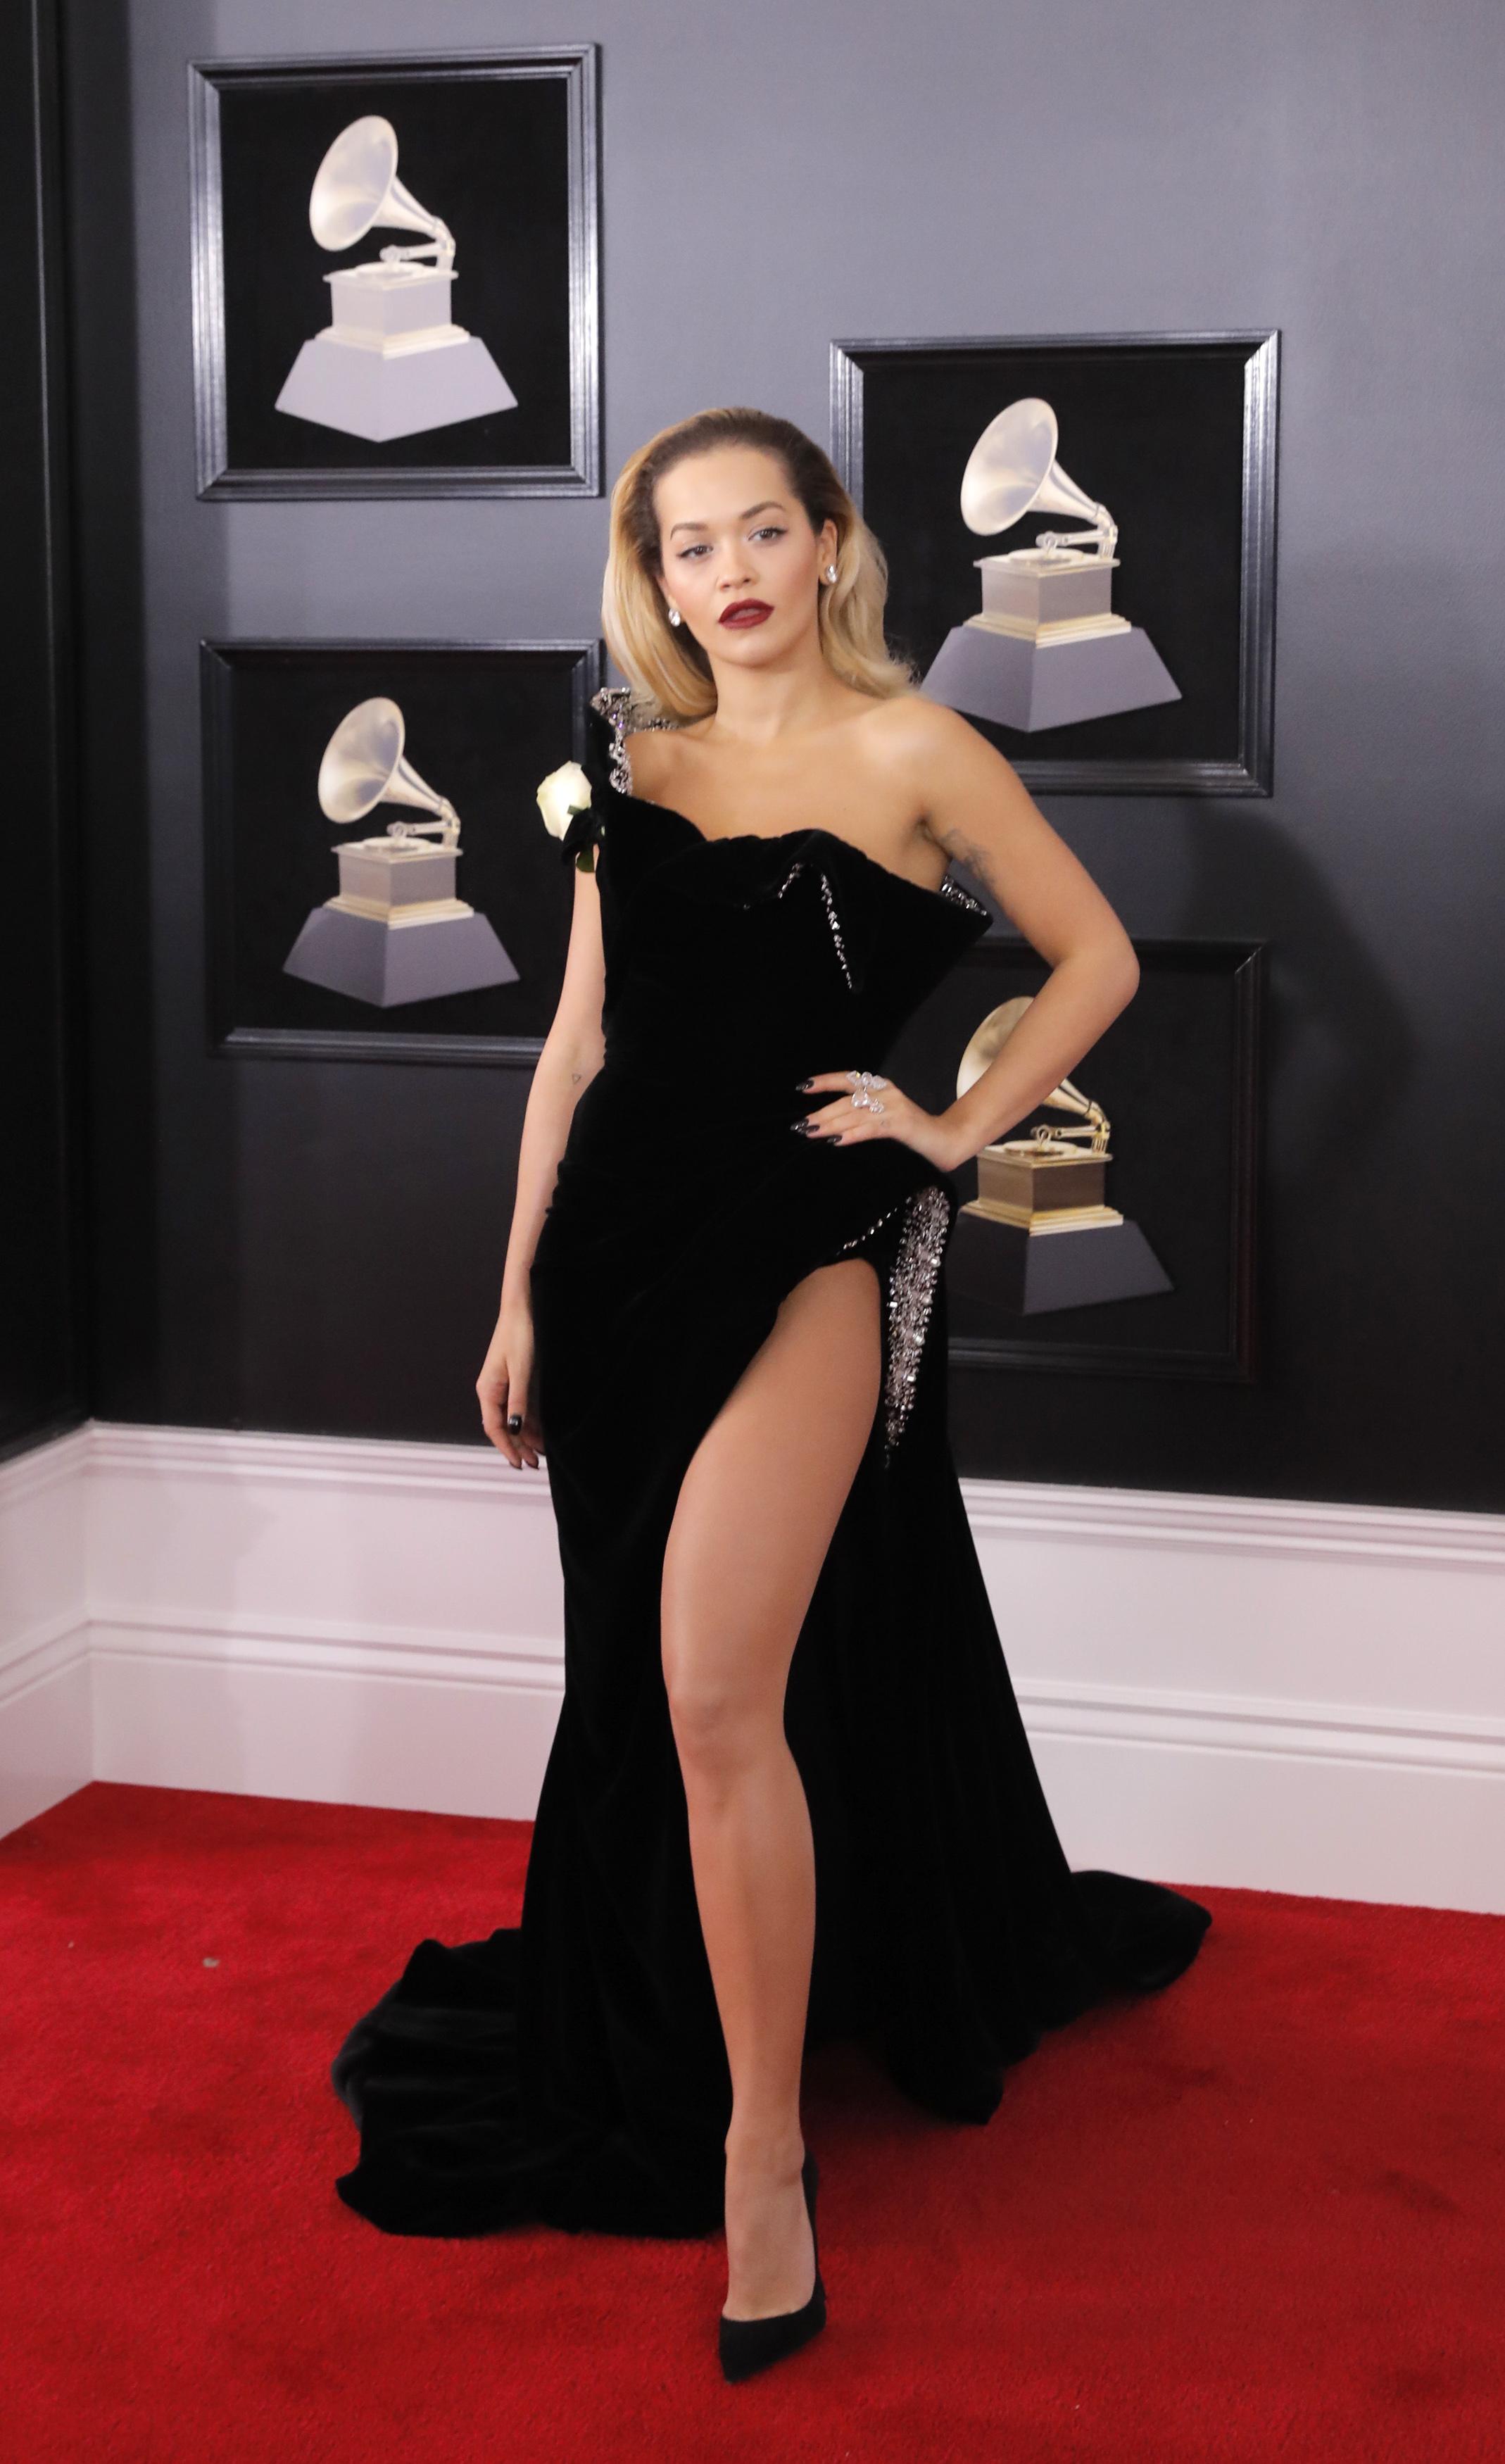 60th Annual Grammy Awards  Arrivals  New York, U.S., 28/01/2018  Singer Rita Ora. REUTERS/Andrew Kelly - HP1EE1T001B15